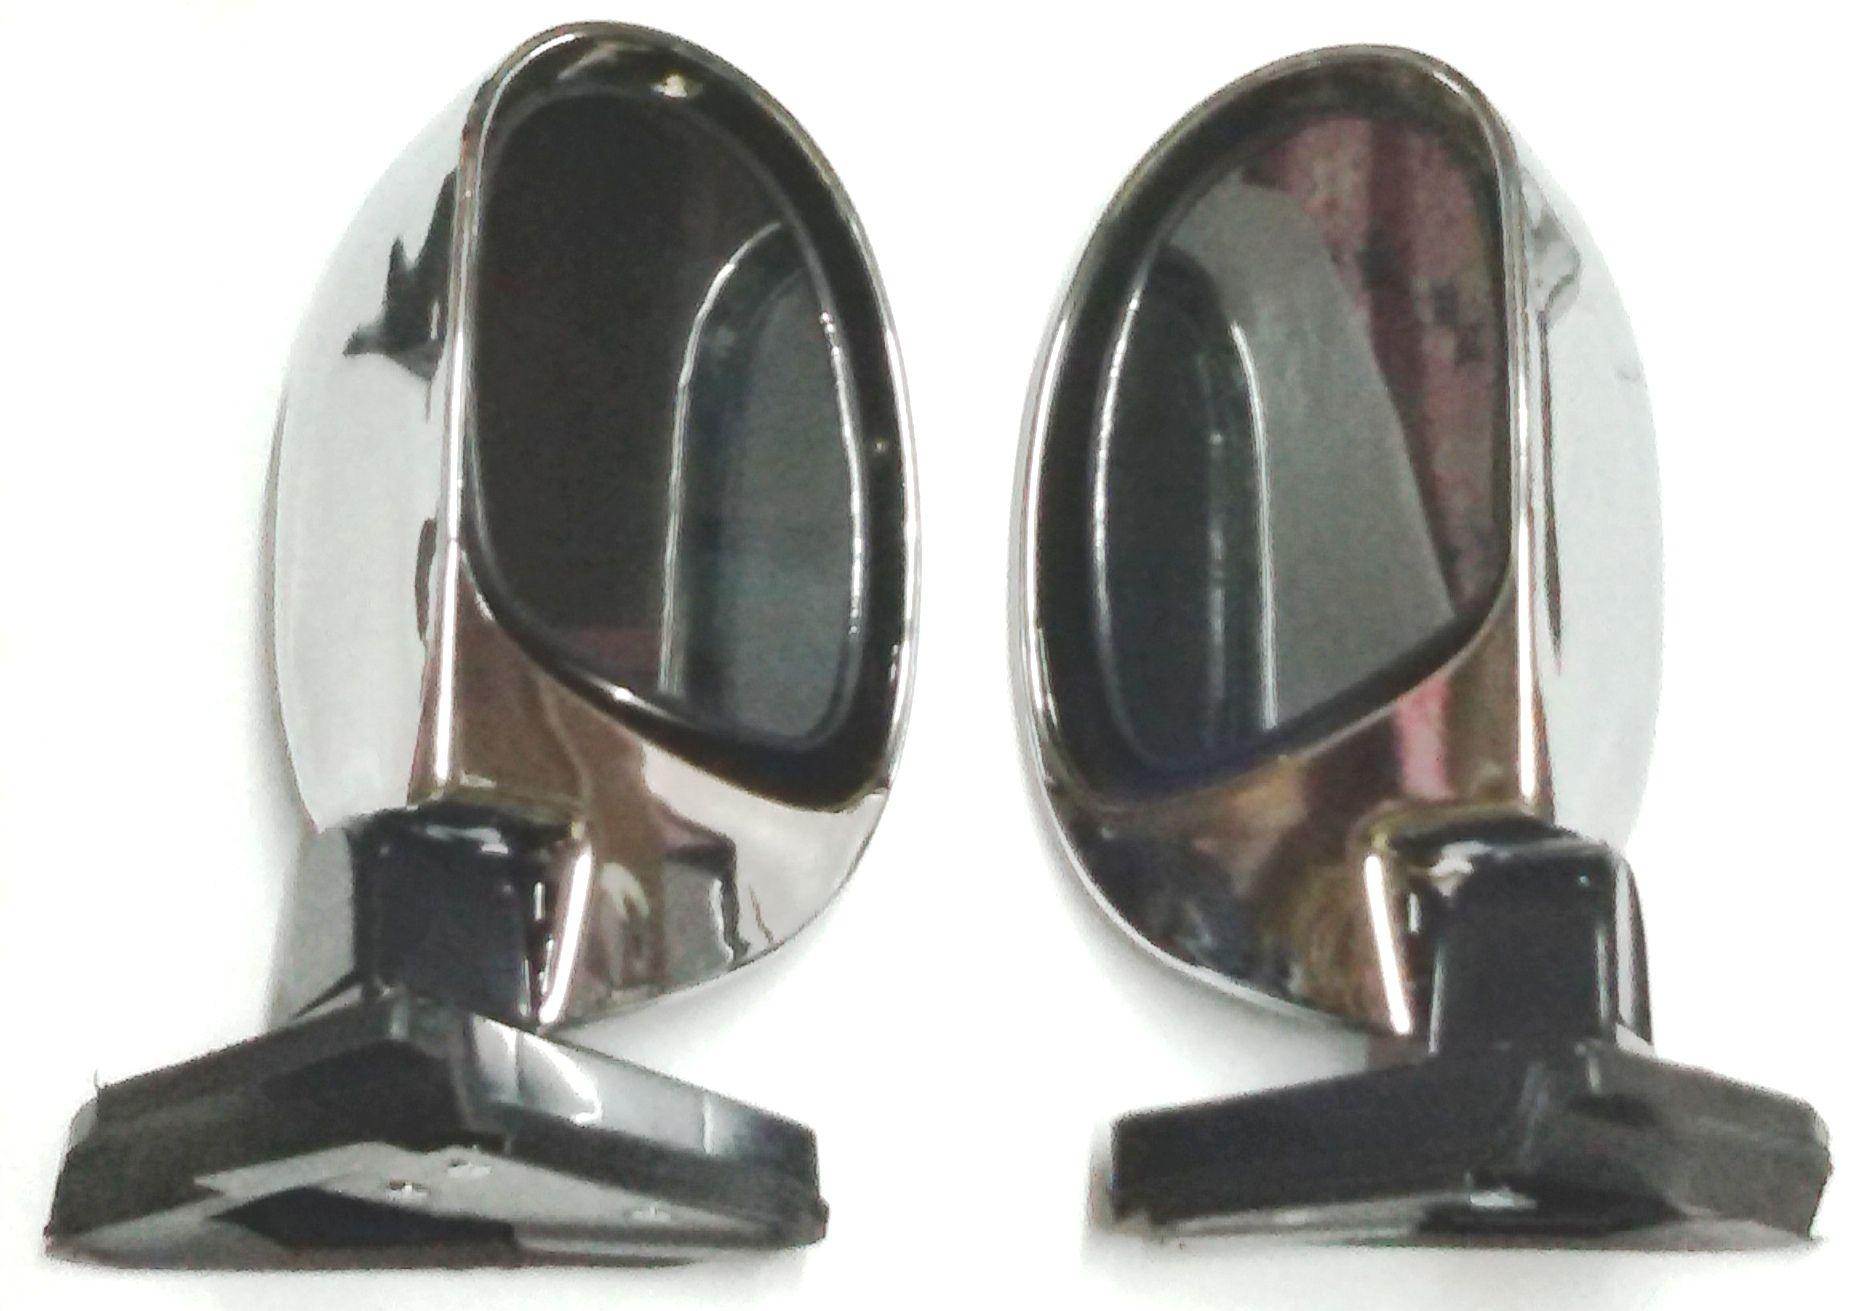 UNIVERSAL SIDE DOOR MIRROR CHROME(SET OF 2 PCS)